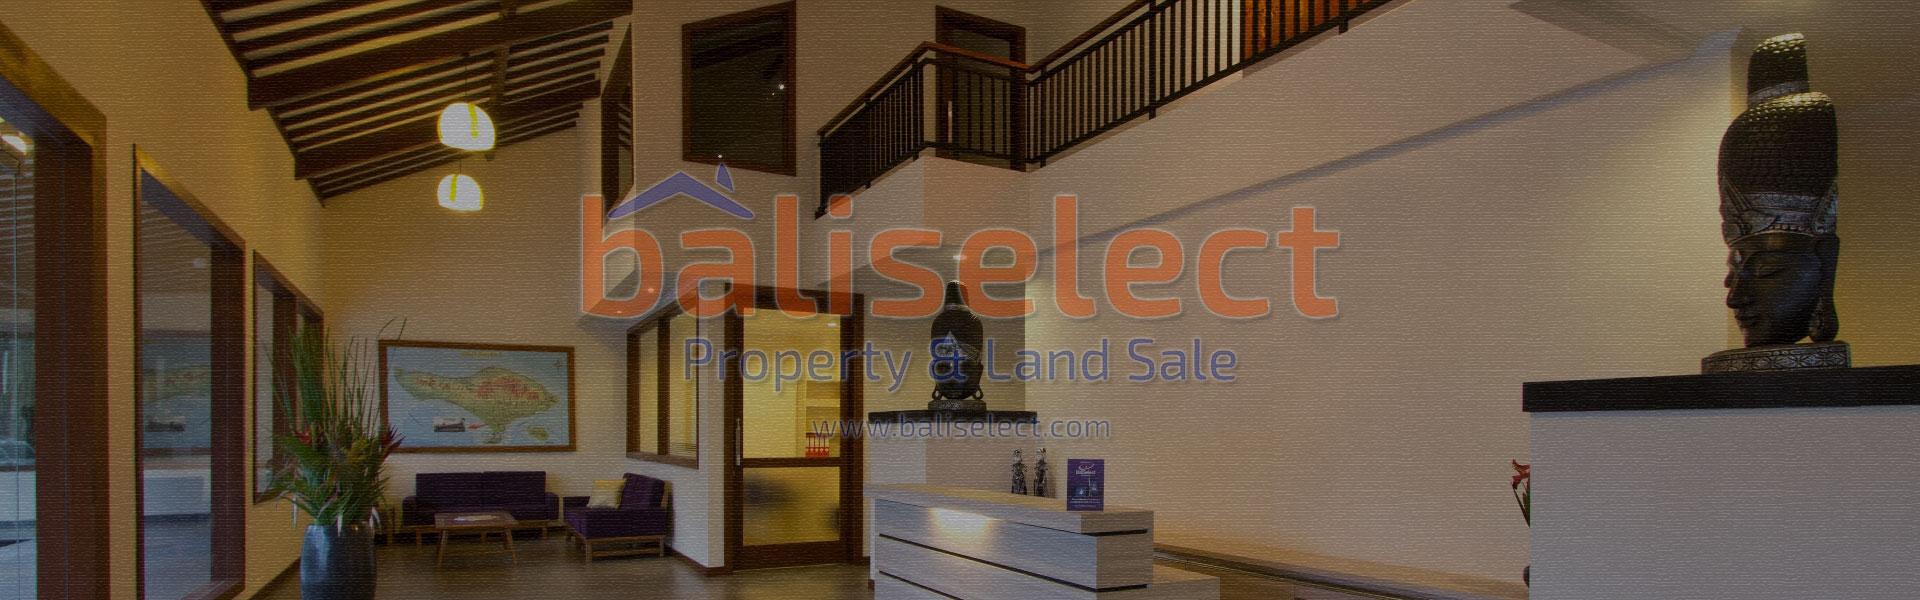 Bali Select Property & Land Sale